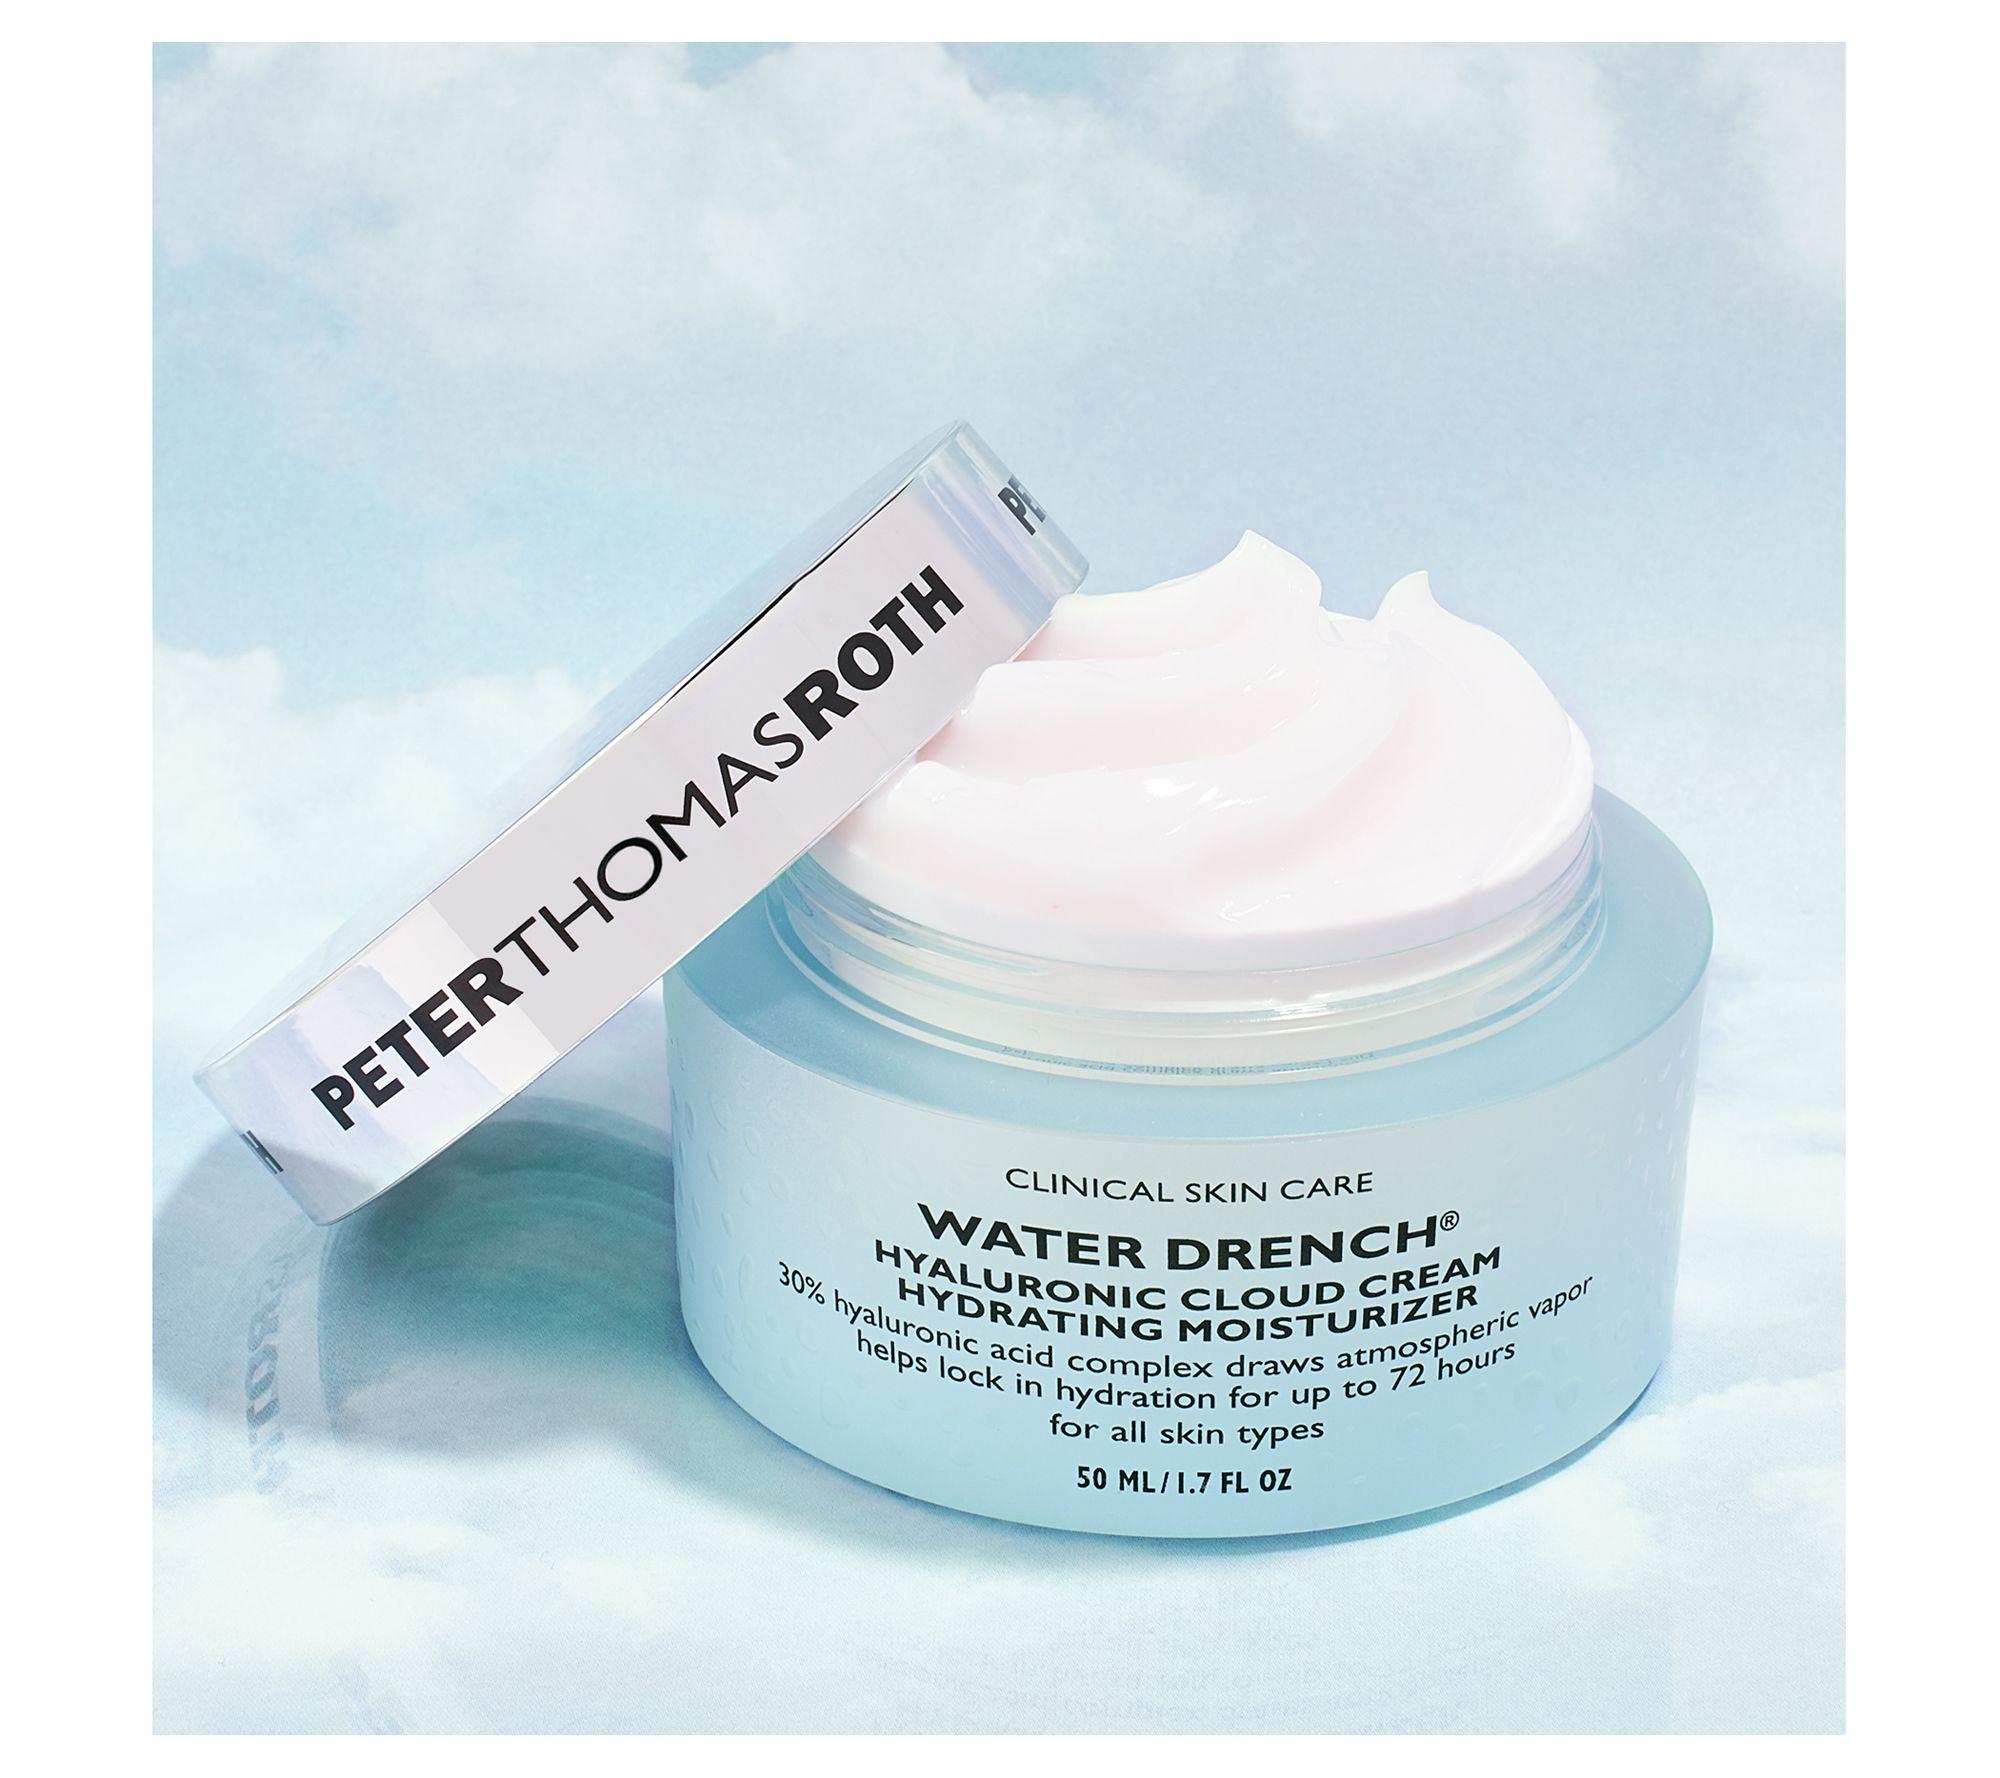 e3e215ce89 Peter Thomas Roth Water Drench Cloud Cream - Page 1 — QVC.com